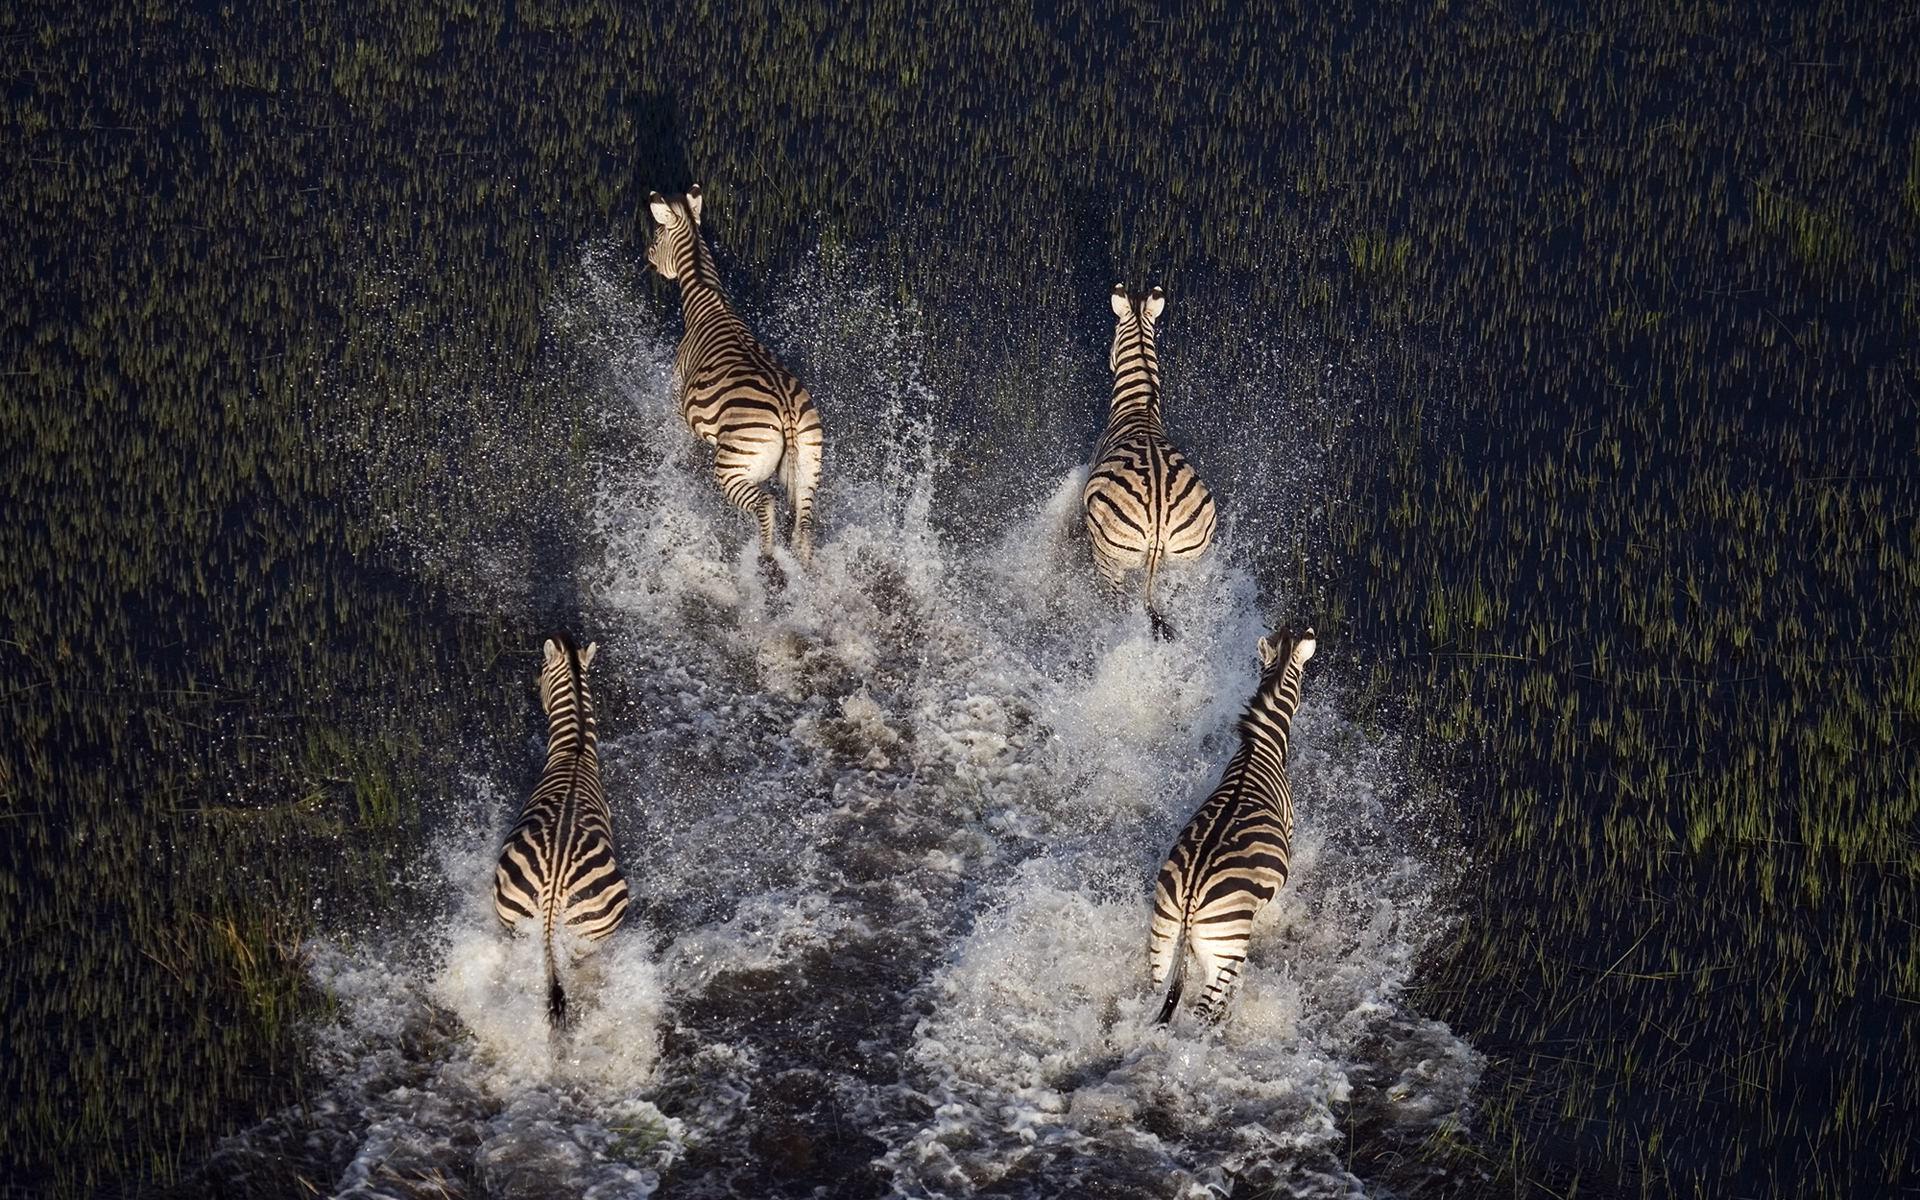 Fantastic Wallpaper Night Animal - animals-night-nature-zebras-tree-1920x1200-px-727184  Pic.jpg